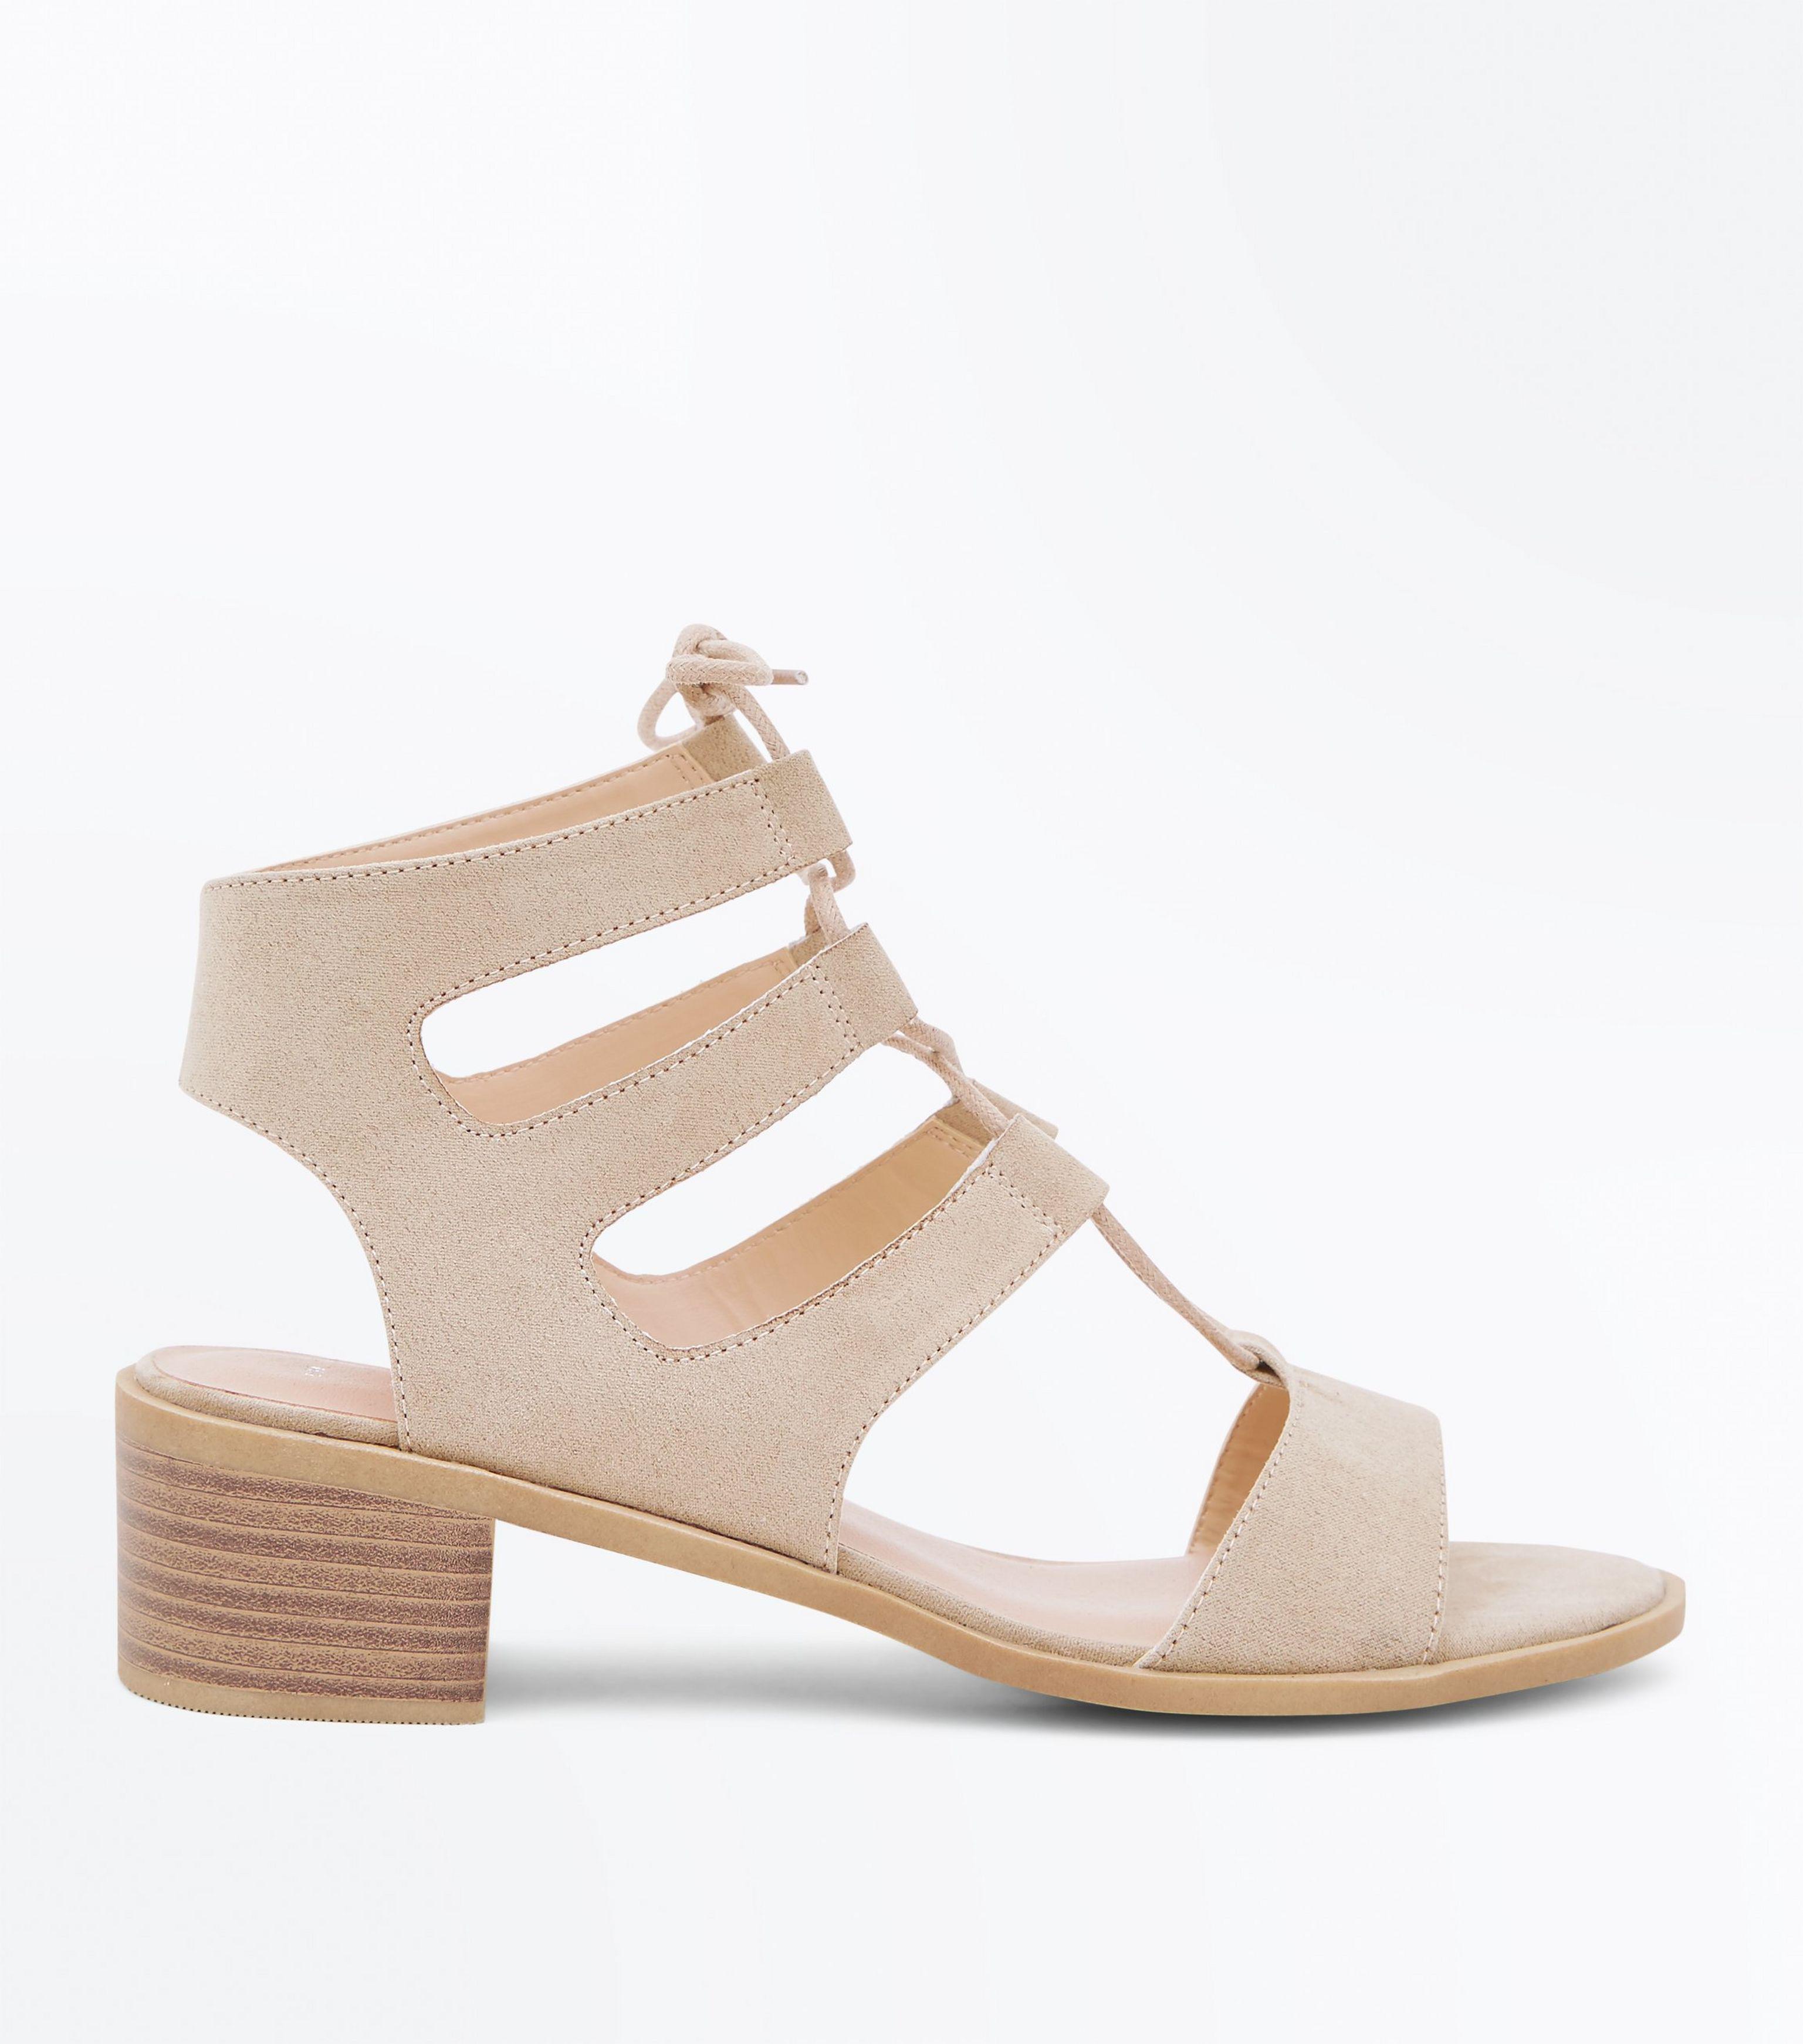 4bfed9d31c0 New Look Wide Fit Brown Suedette Low Heel Ghillie Sandals in Brown ...